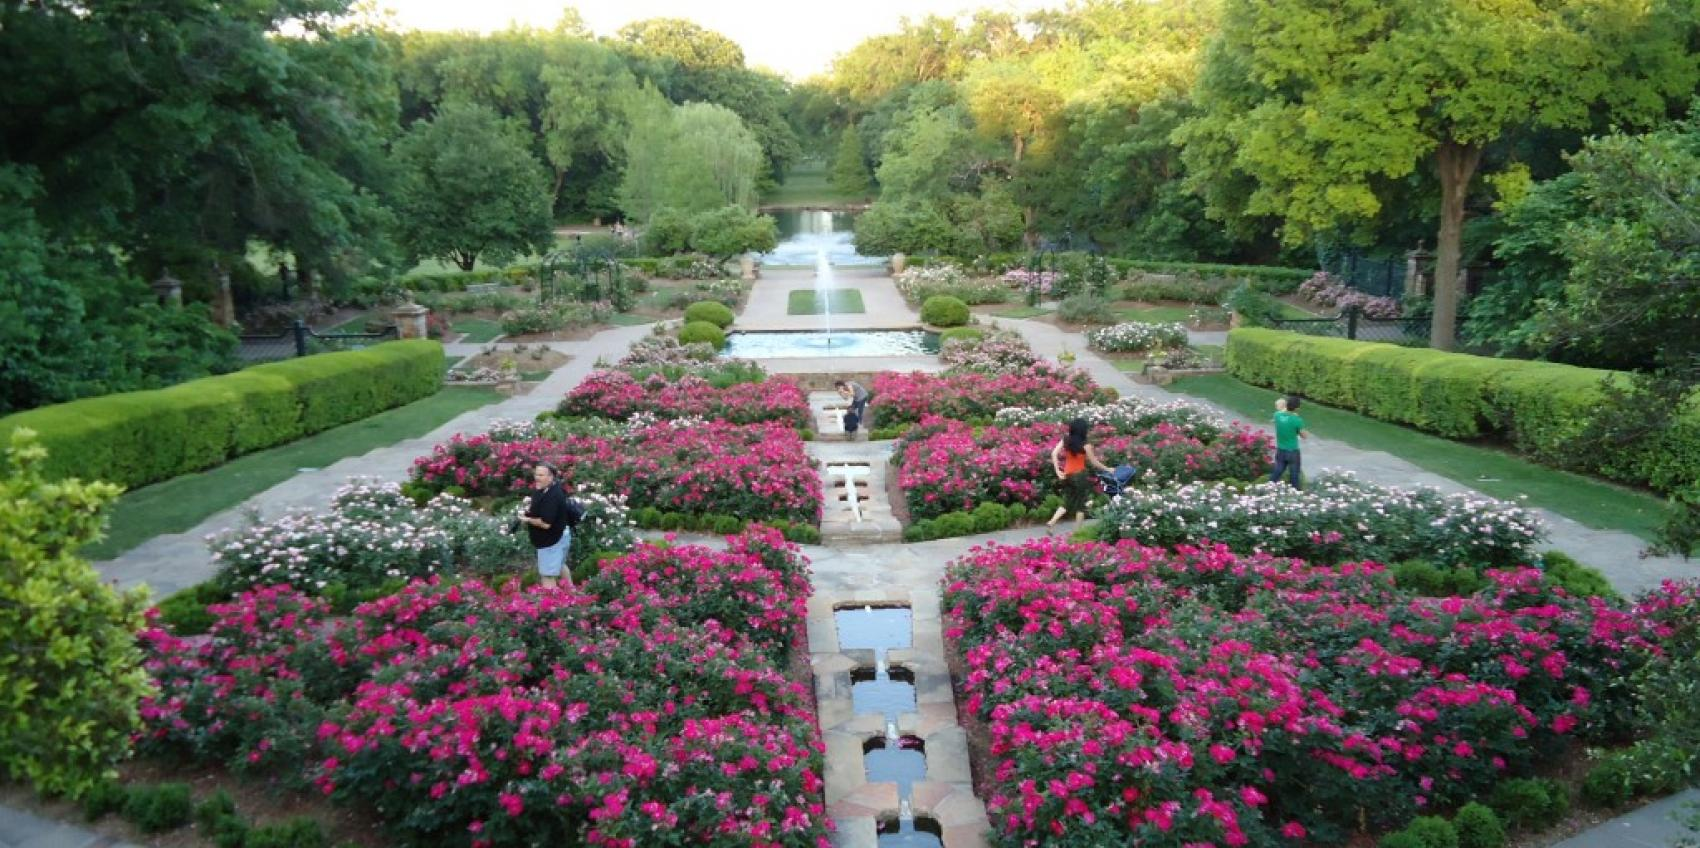 Fort worth botanic garden american public gardens for American garden association